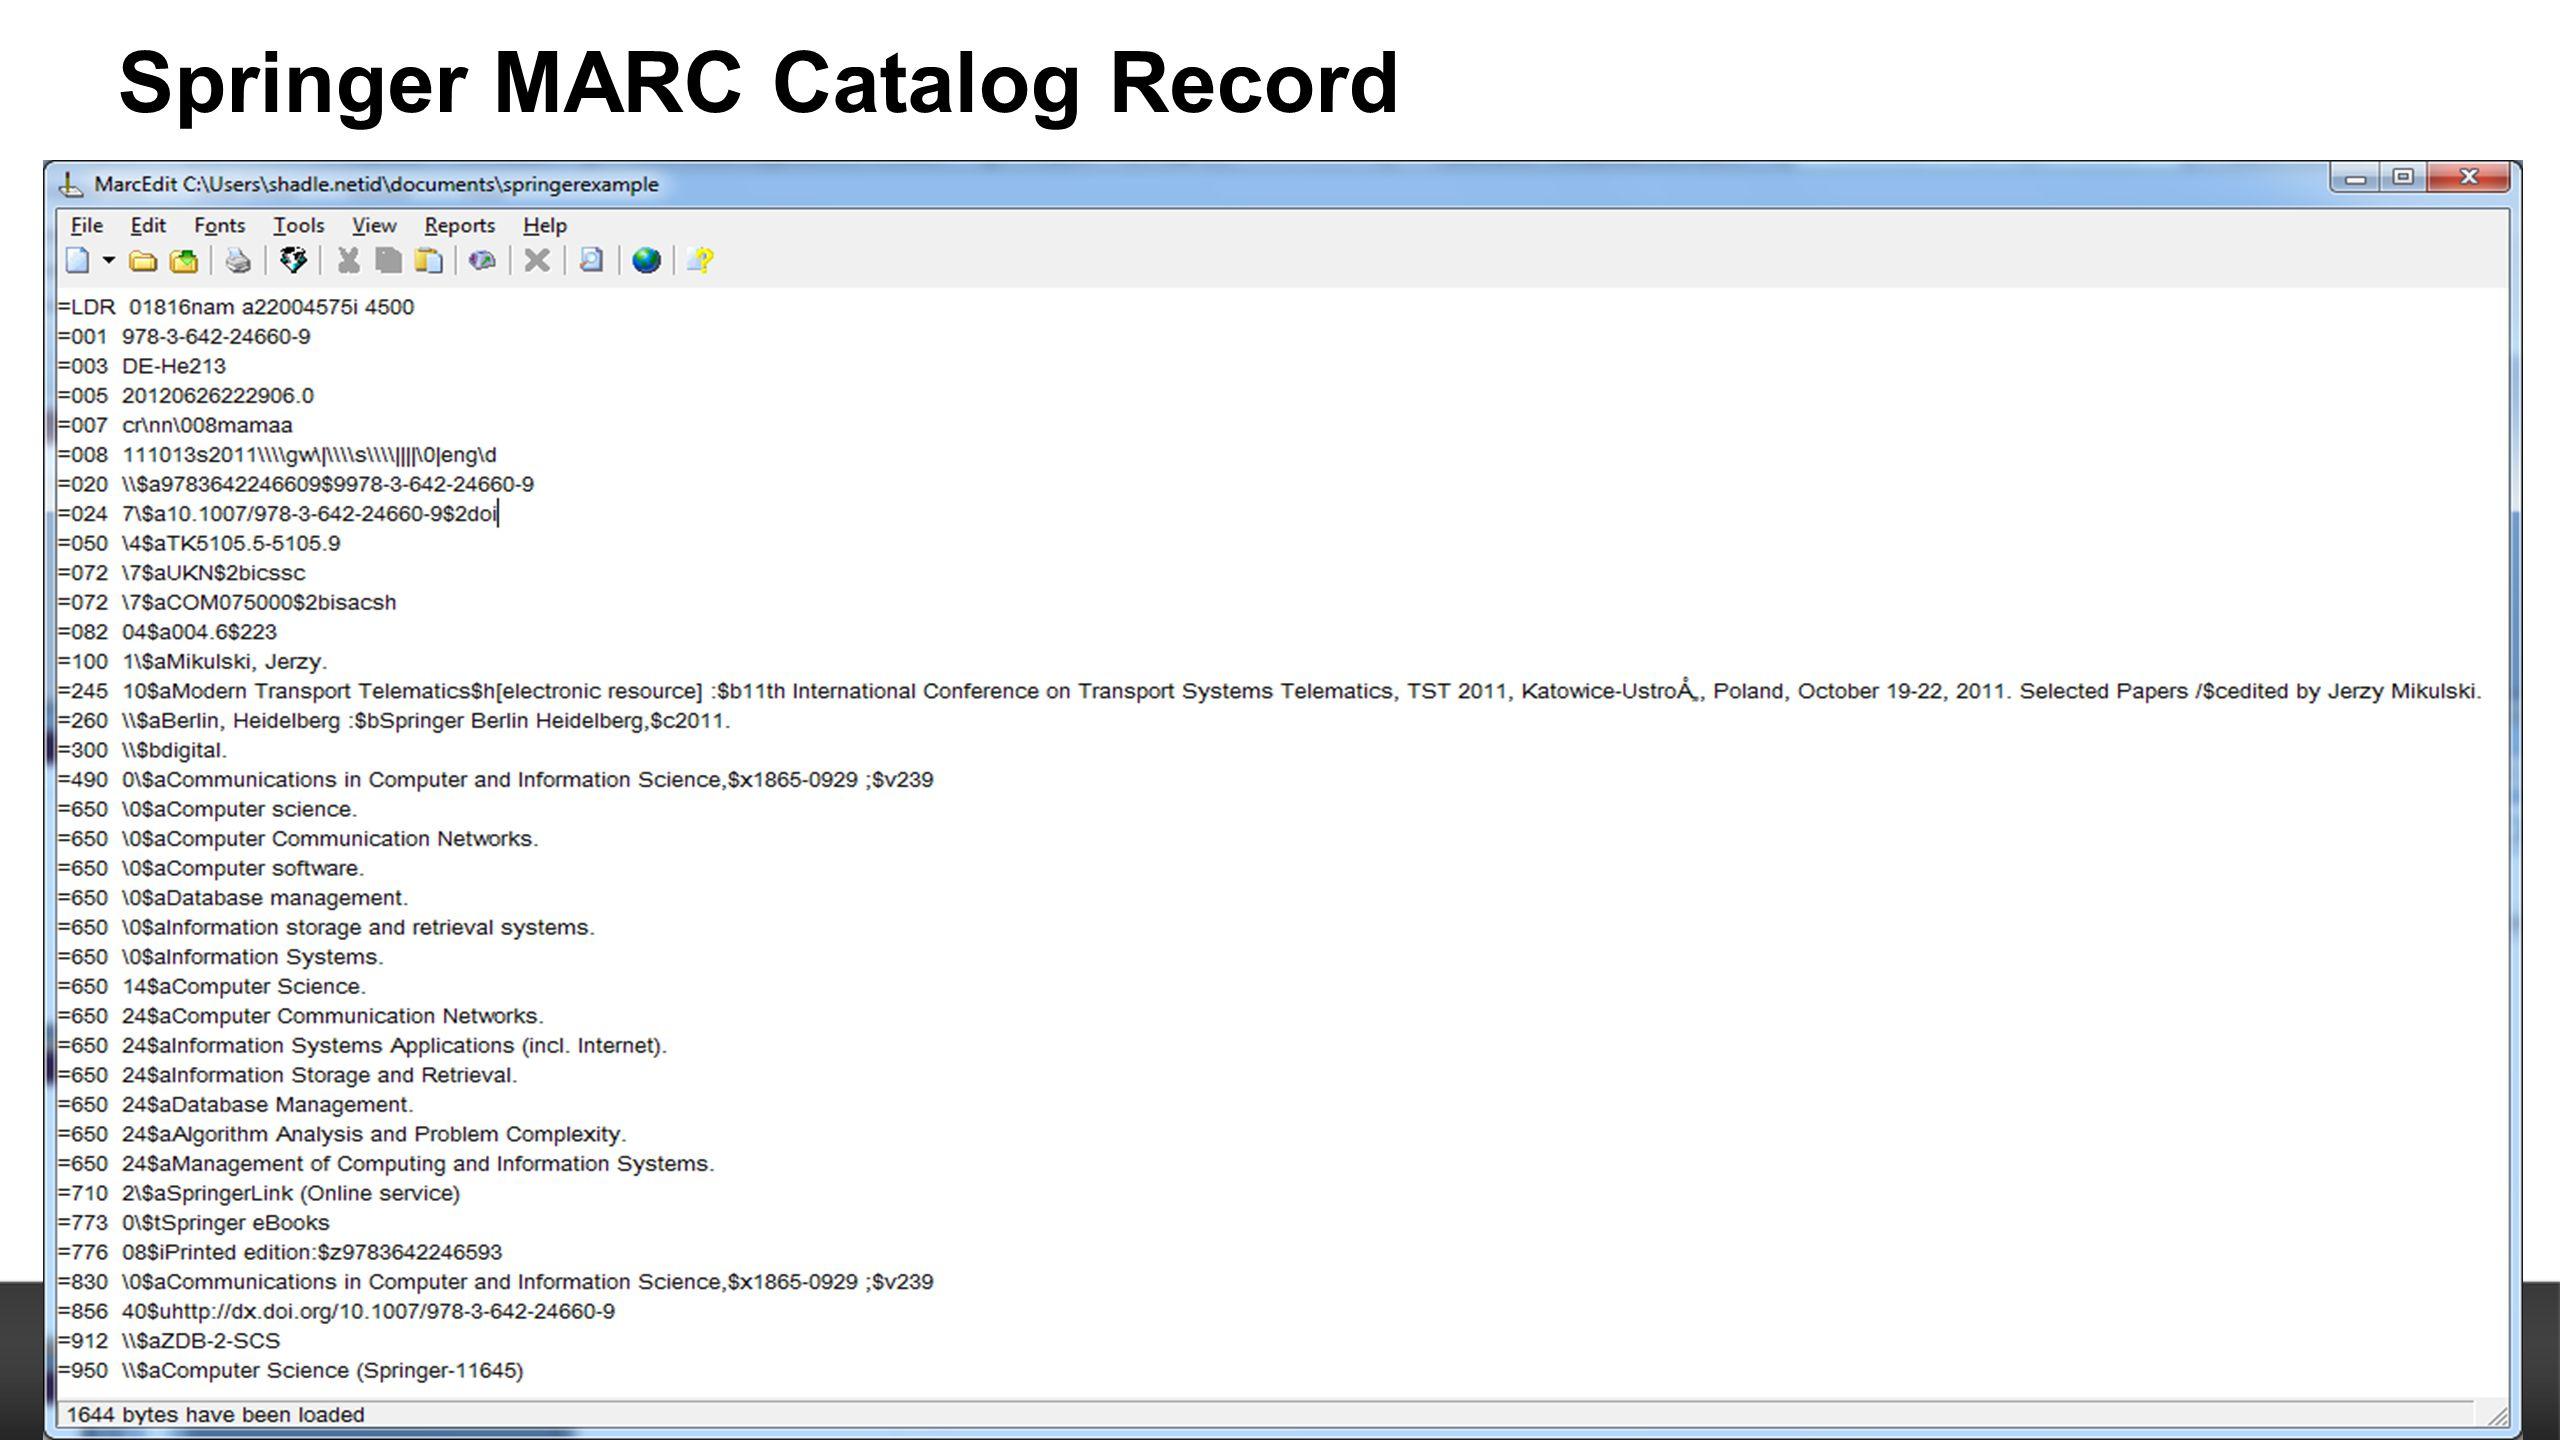 Springer MARC Catalog Record